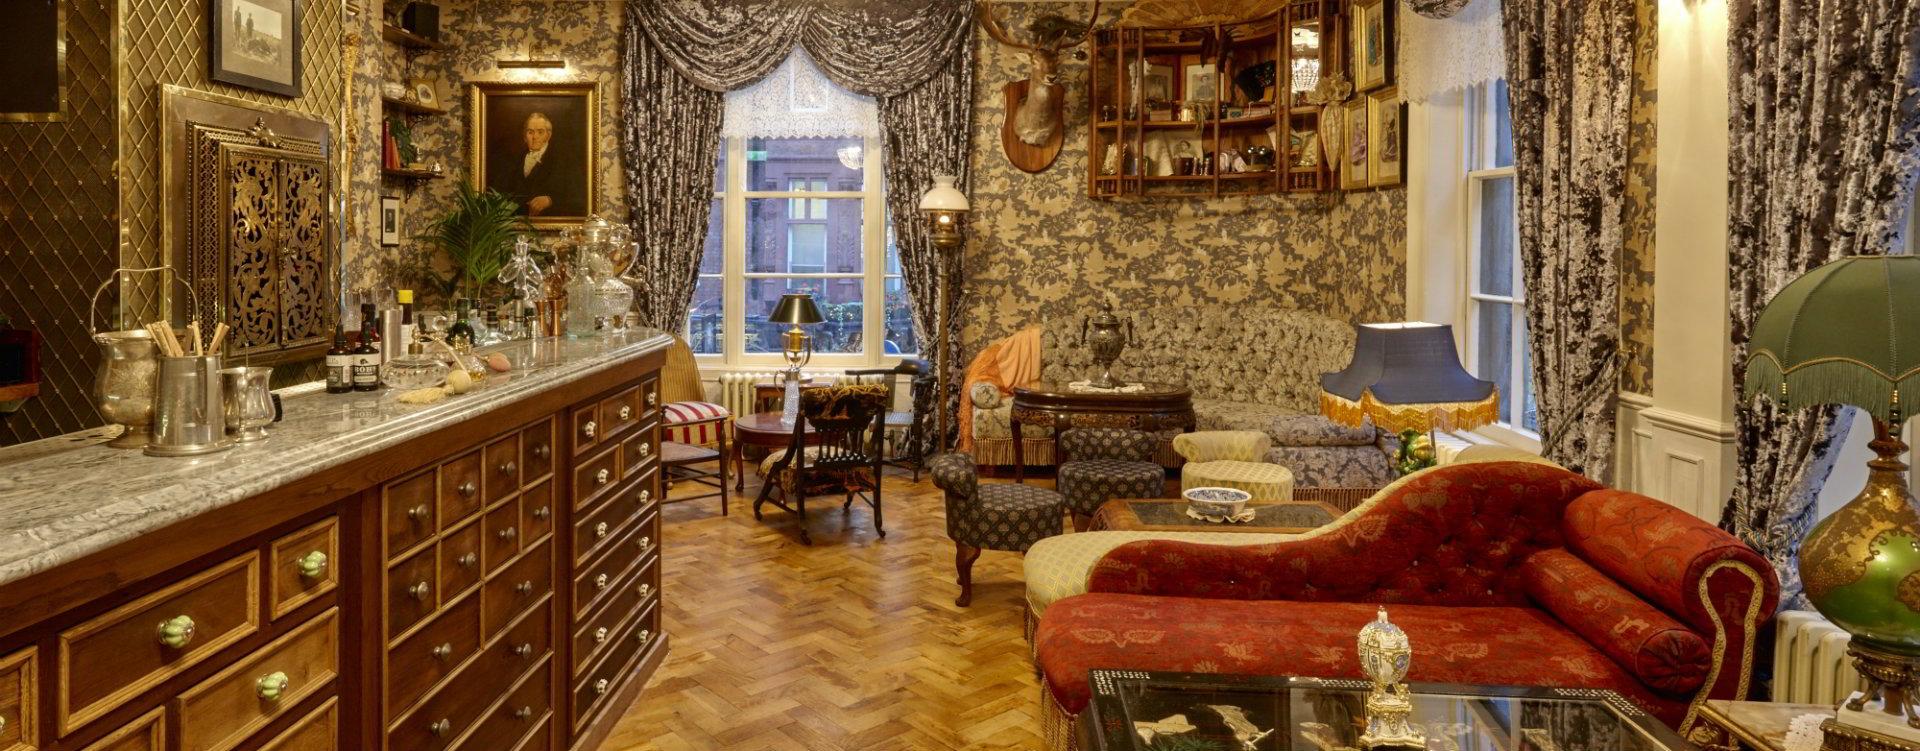 the best bars in covent garden holborn london